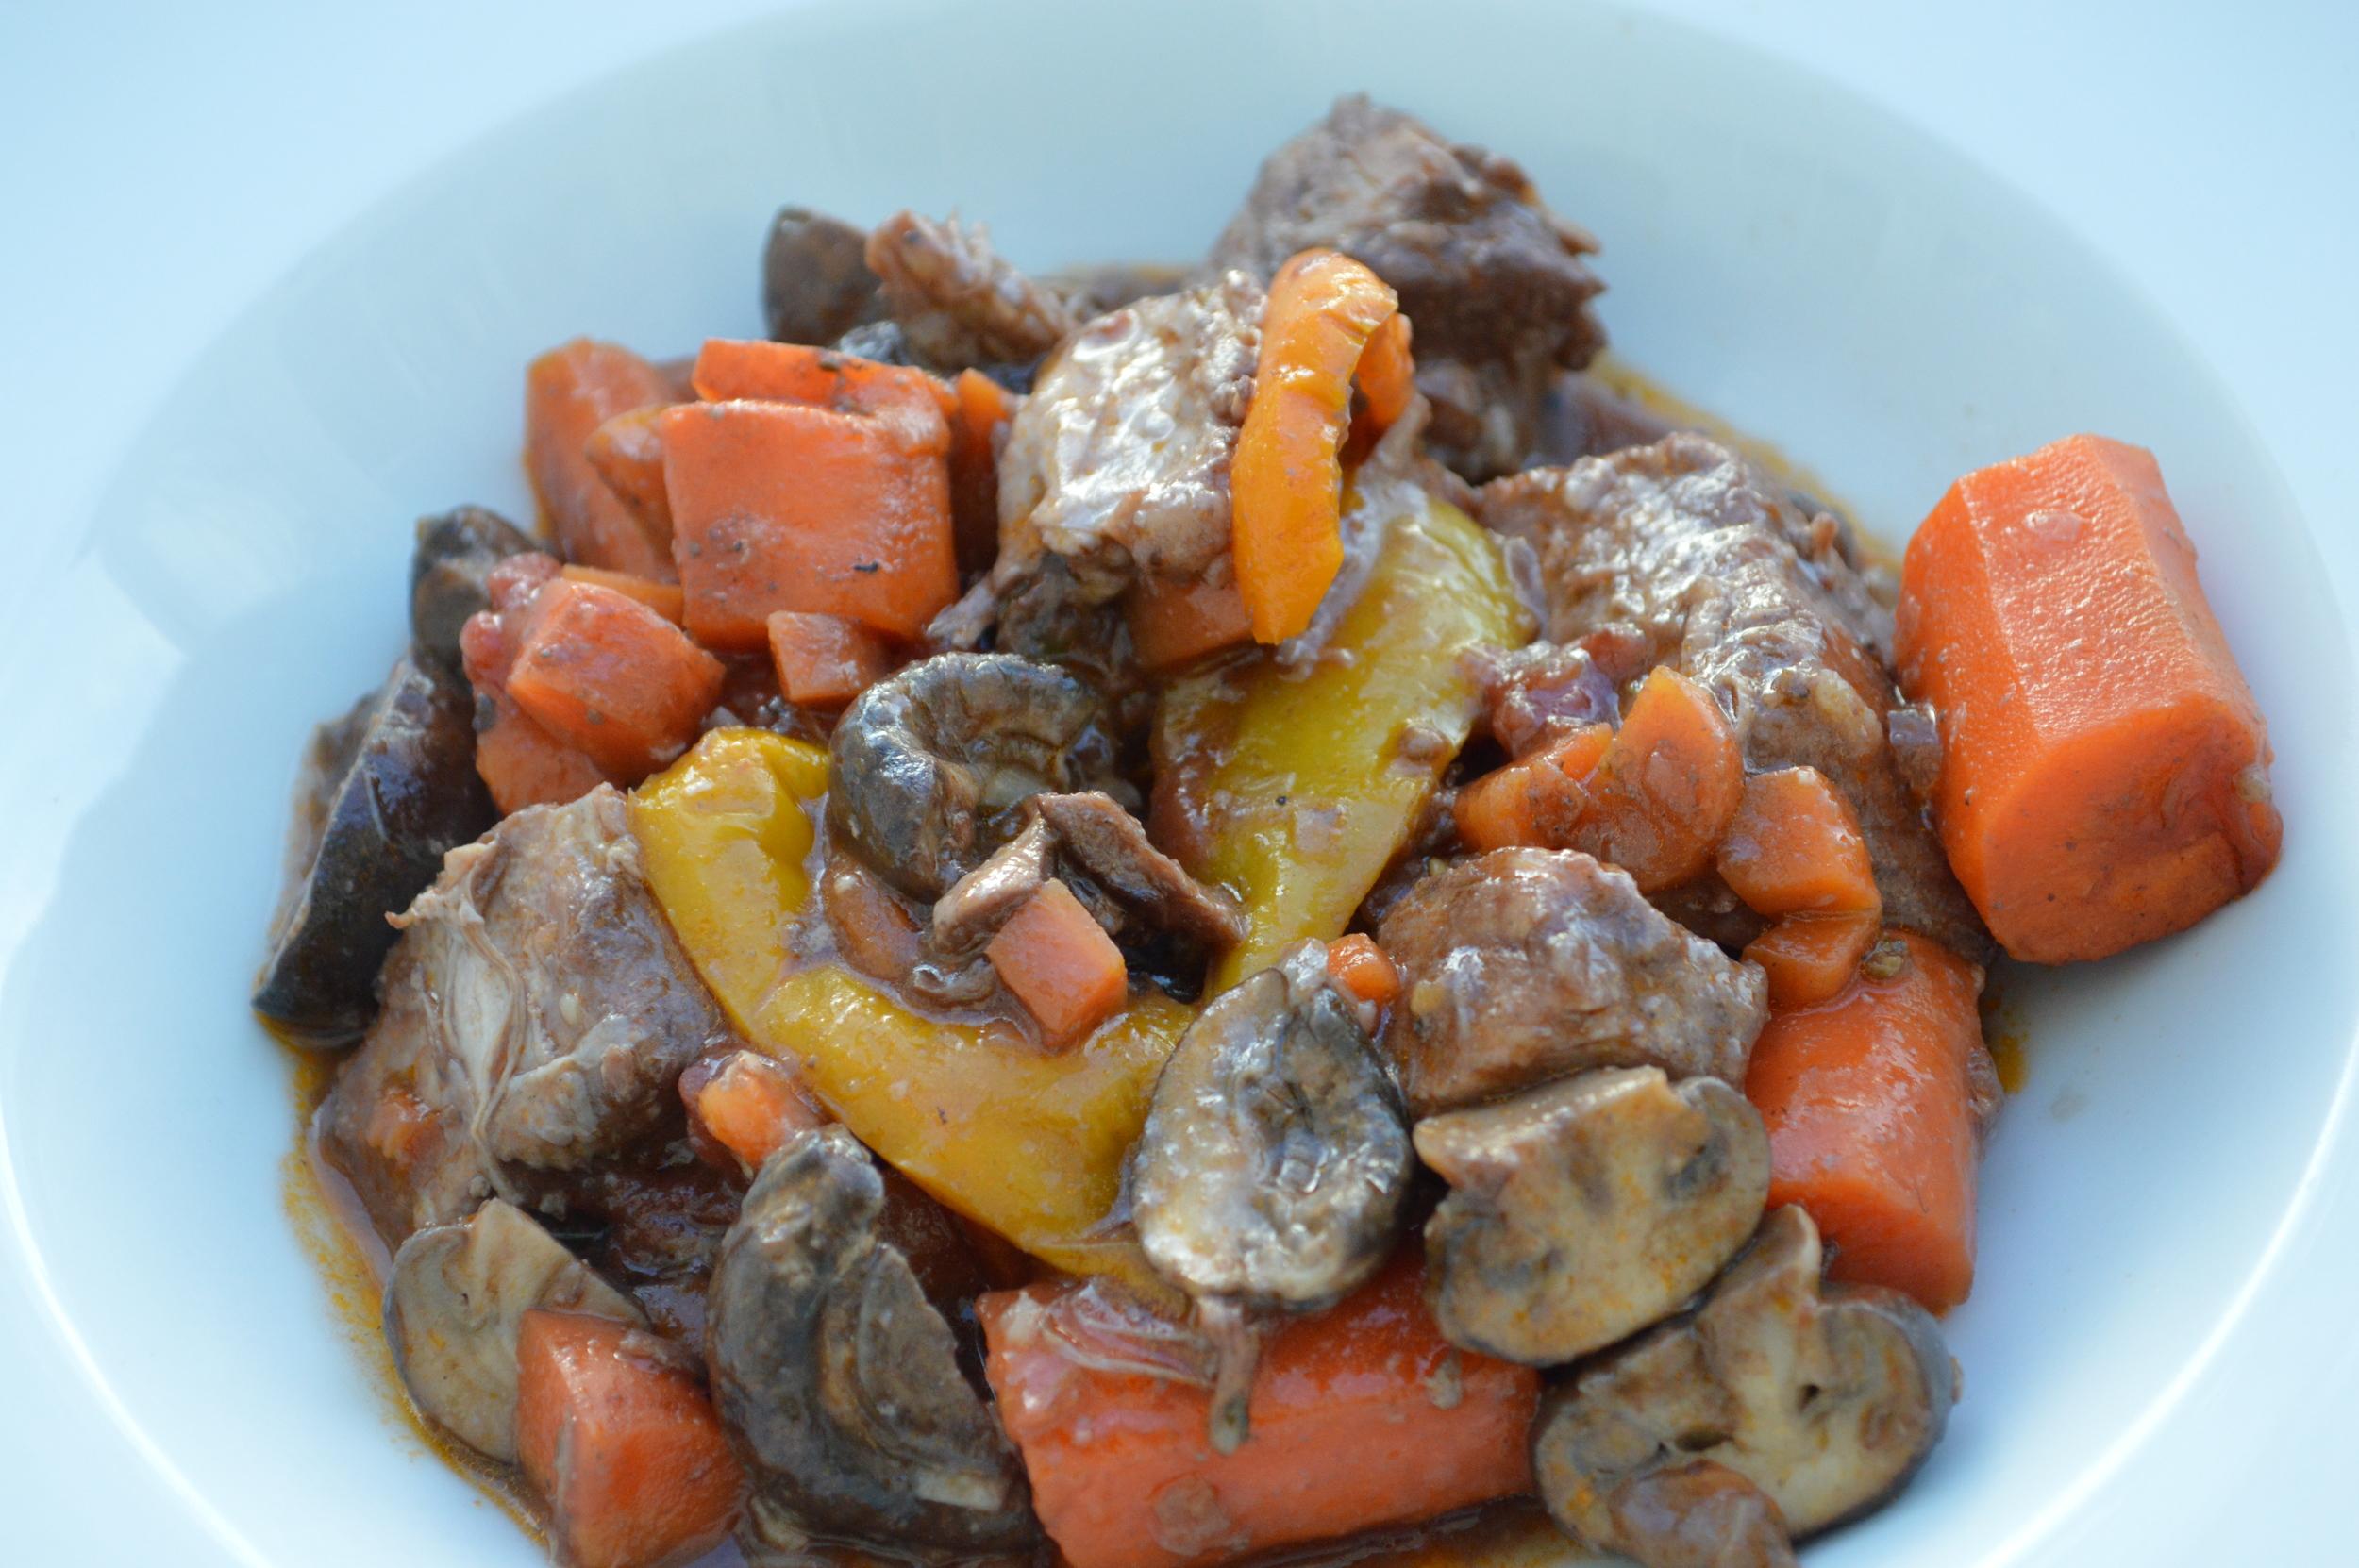 Pork Roast & Veggies